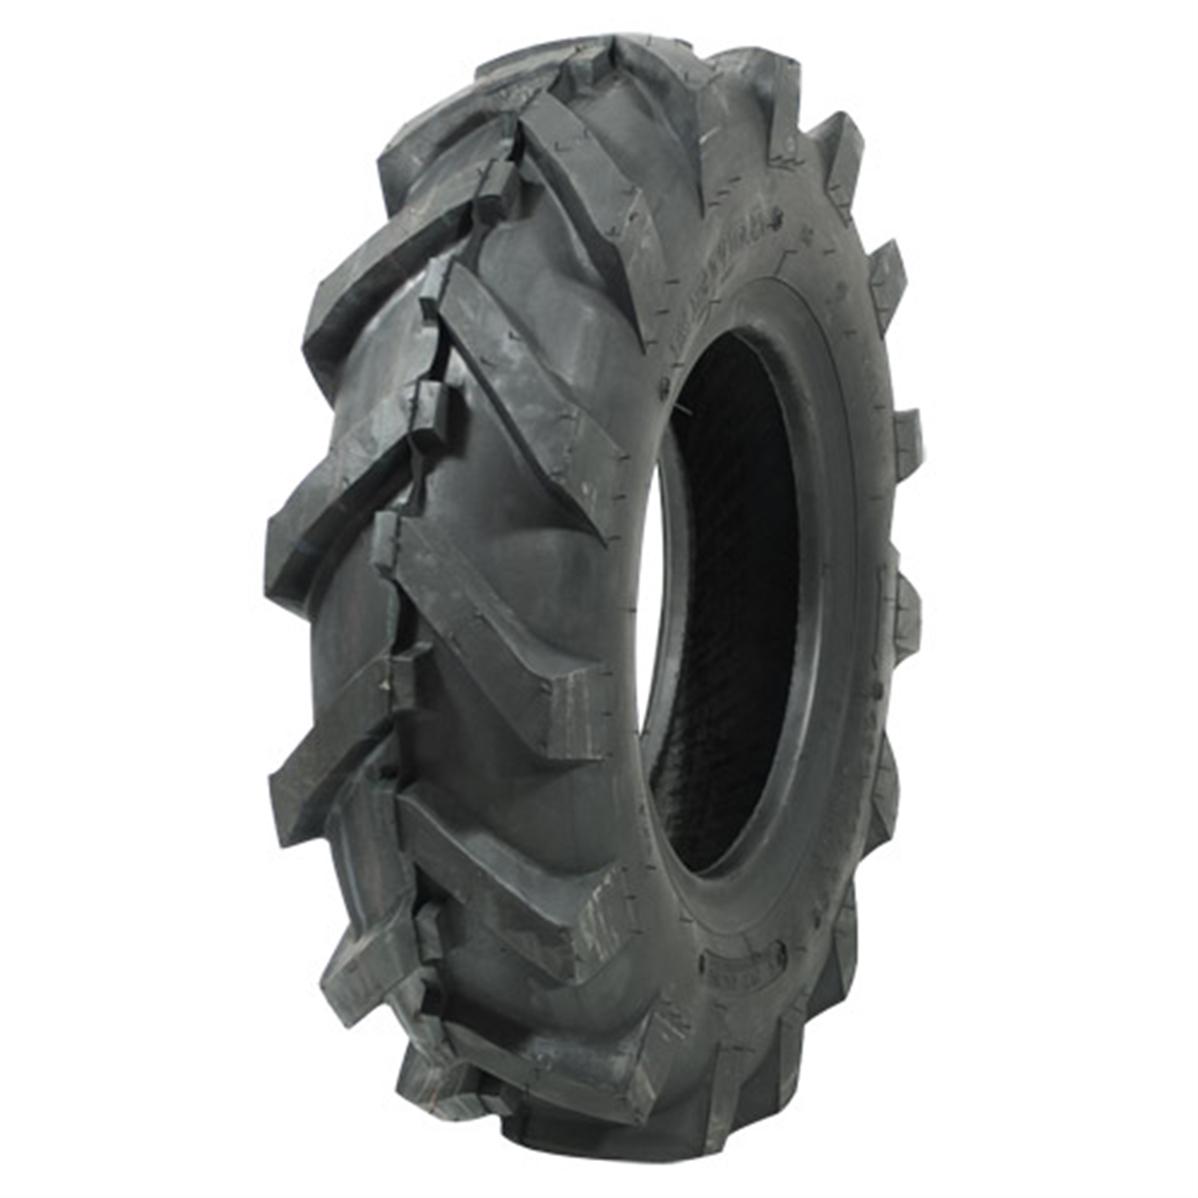 pneu tracteur tondeuse autoport e agraire 500x12. Black Bedroom Furniture Sets. Home Design Ideas